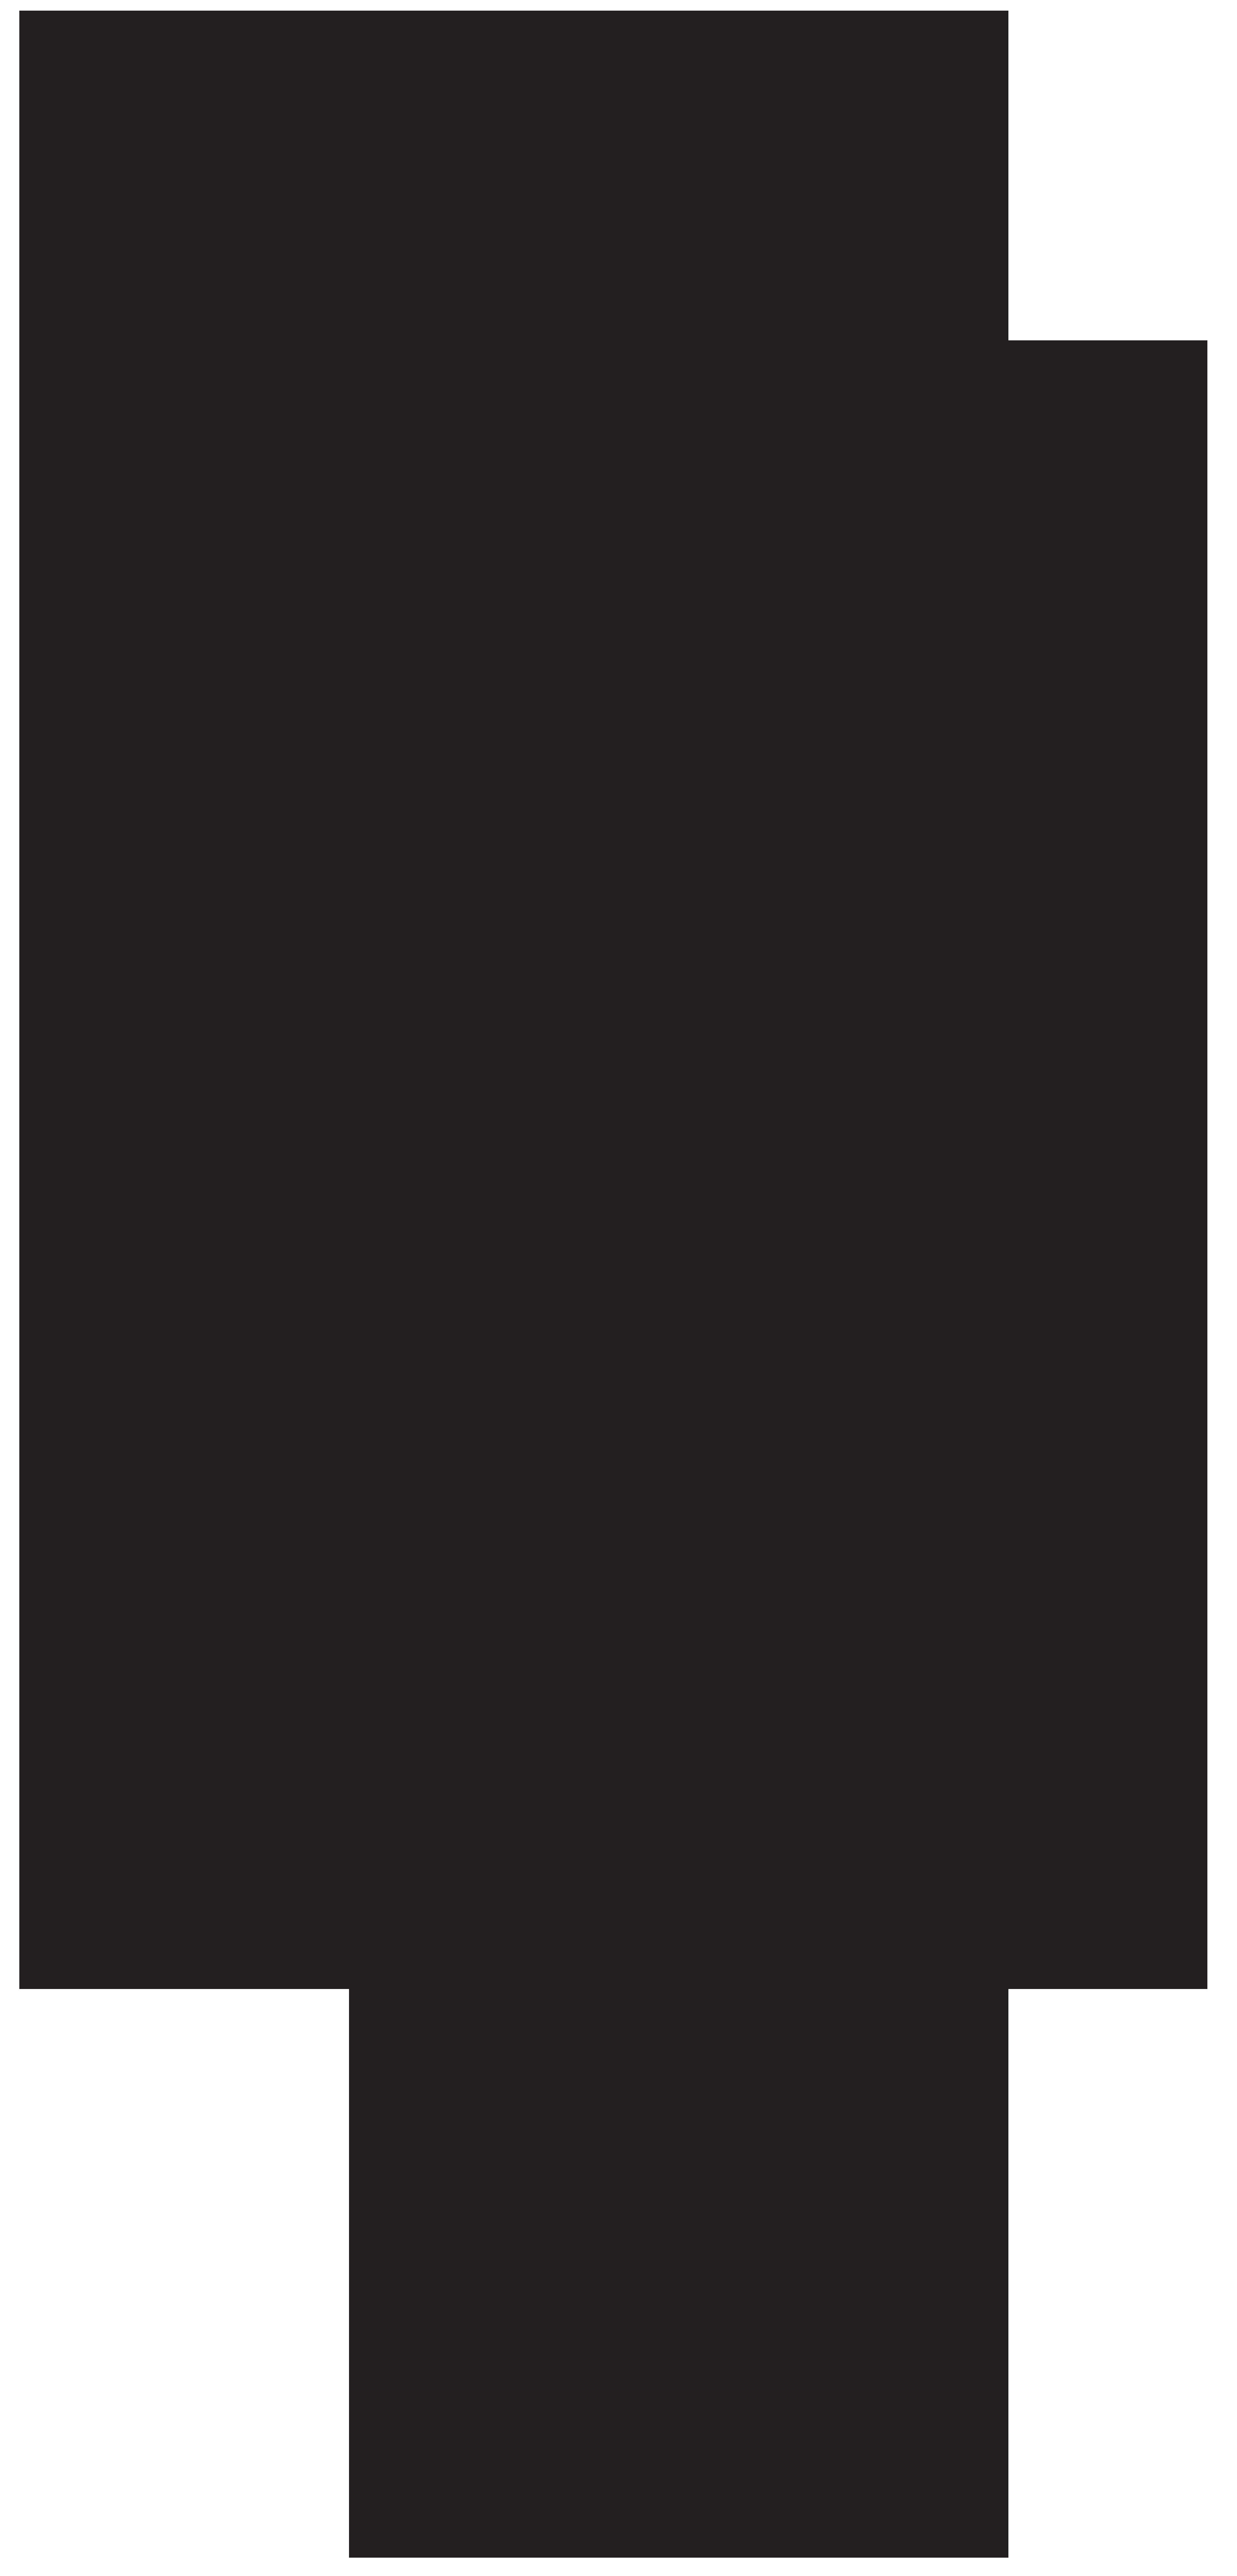 Cowboy silhouette png clip. Warrior clipart polynesian